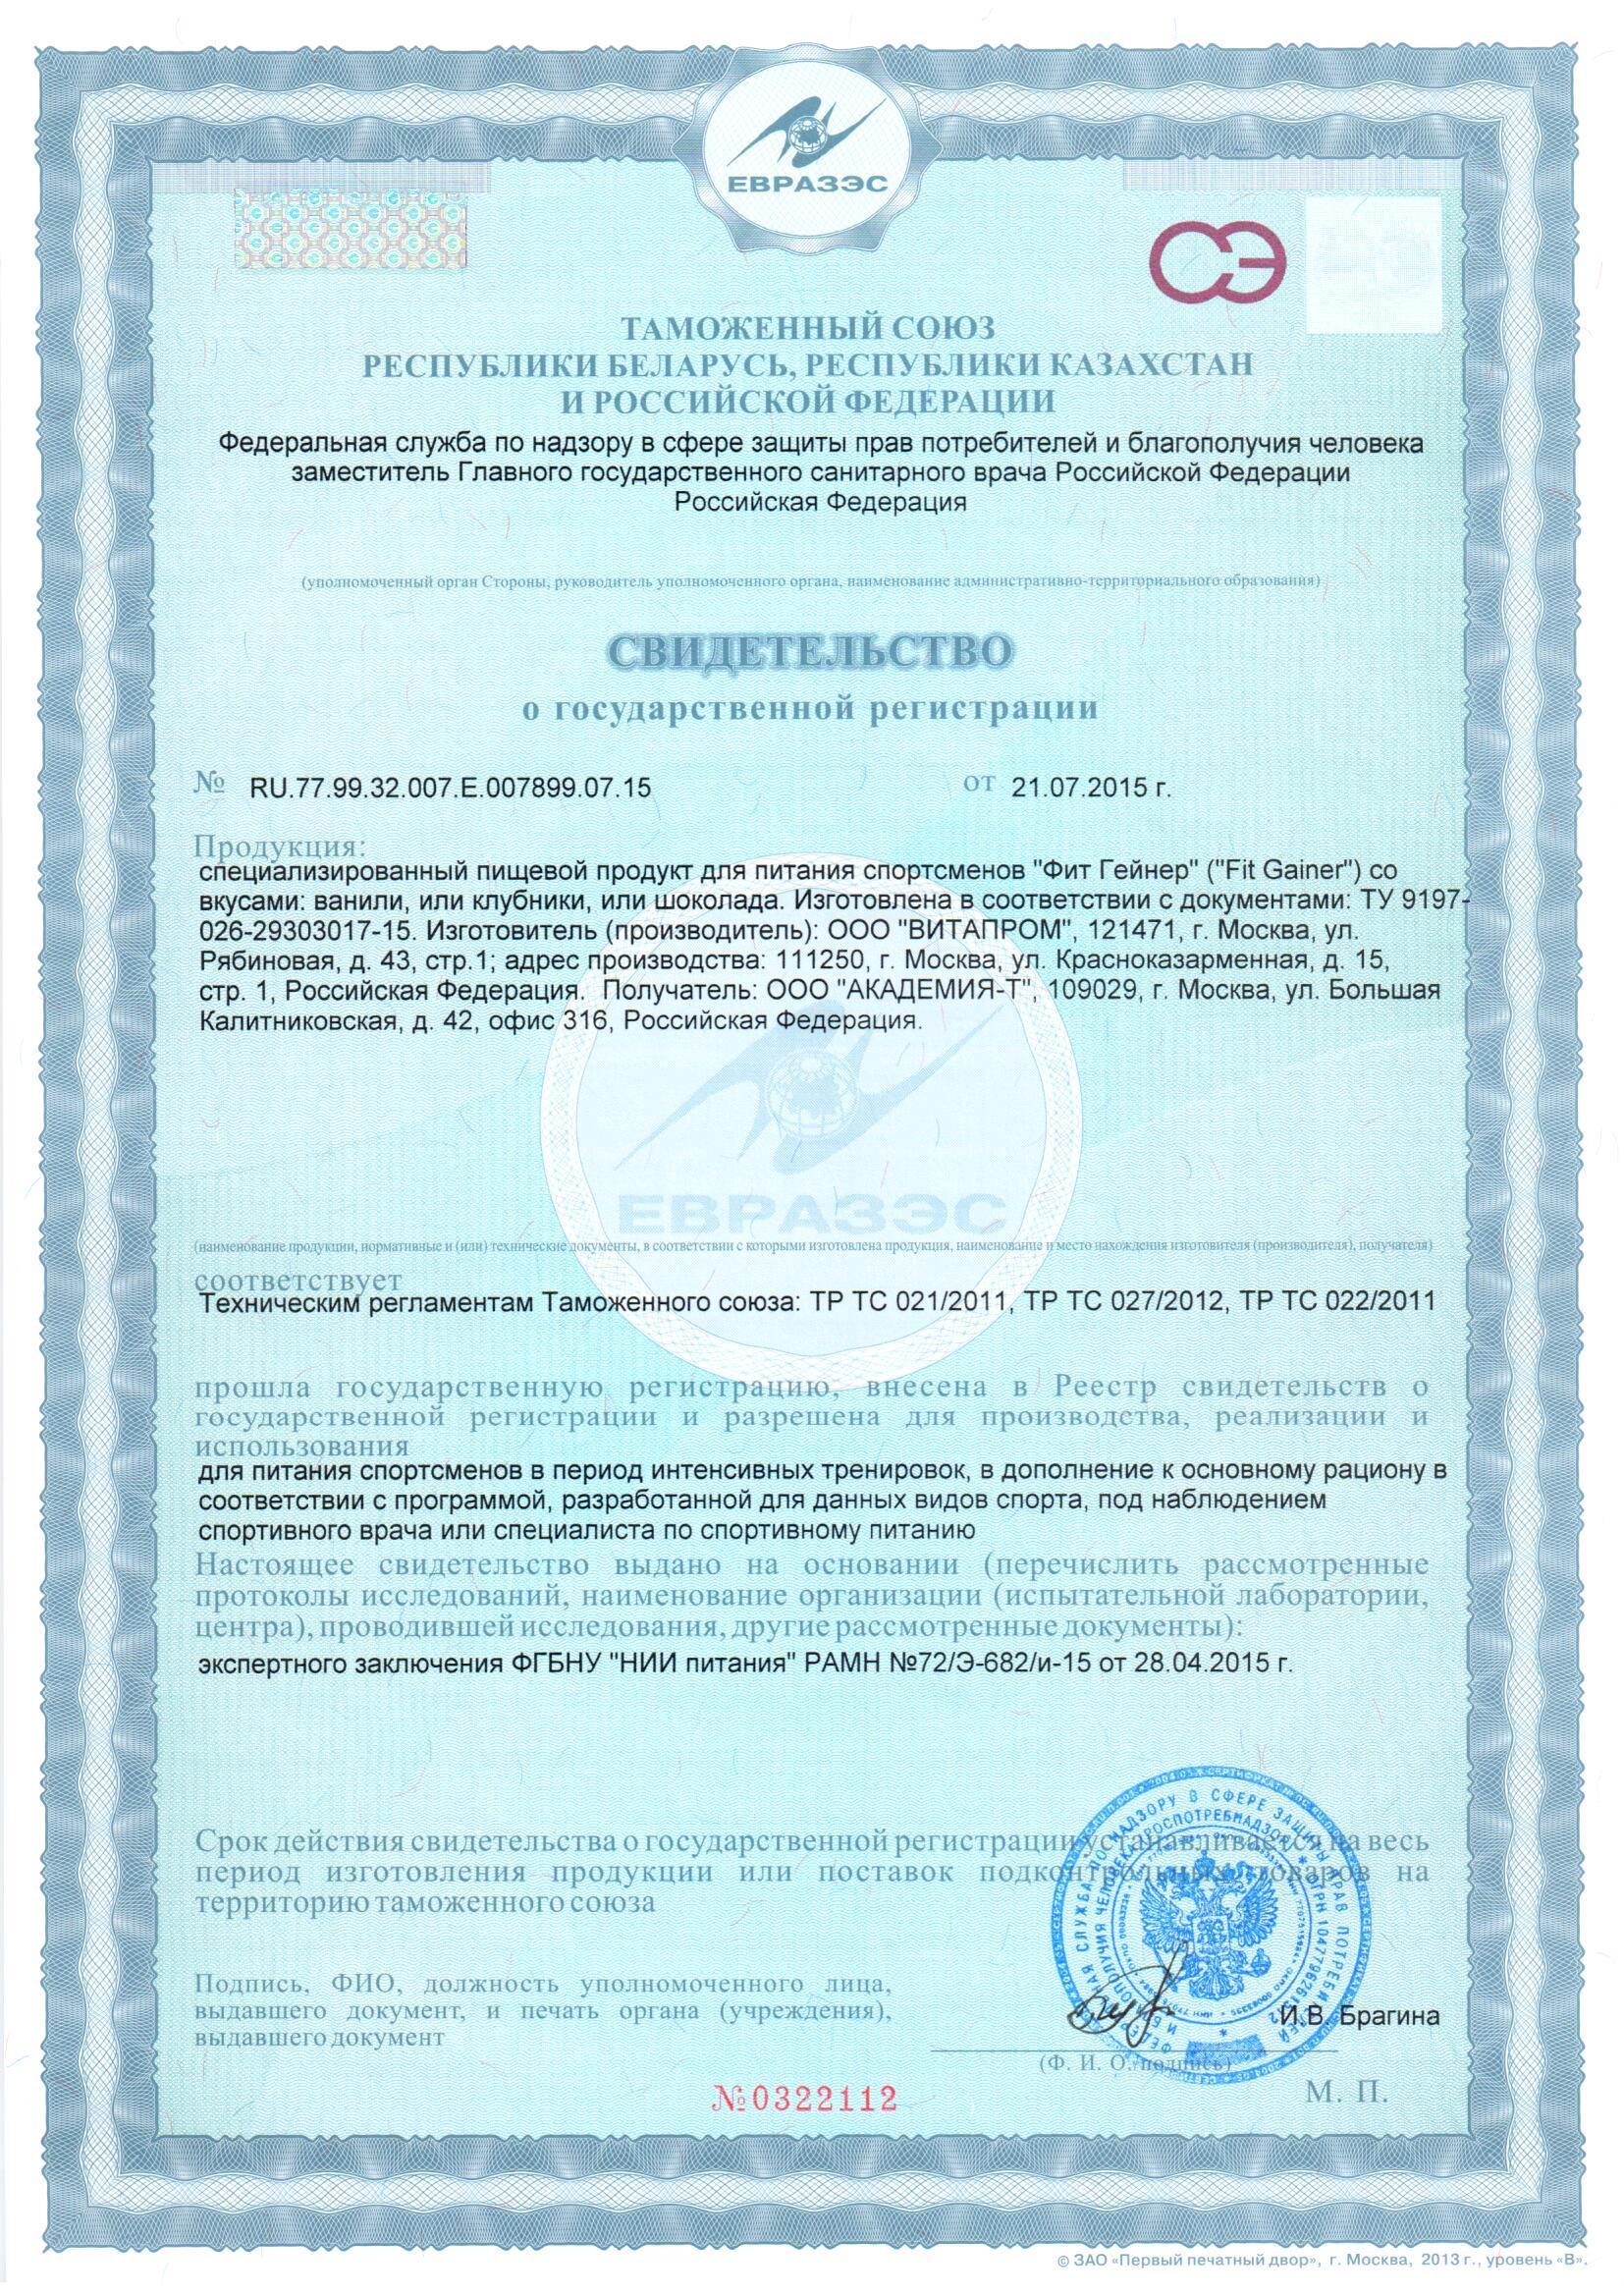 Сертификат FIT GAINER